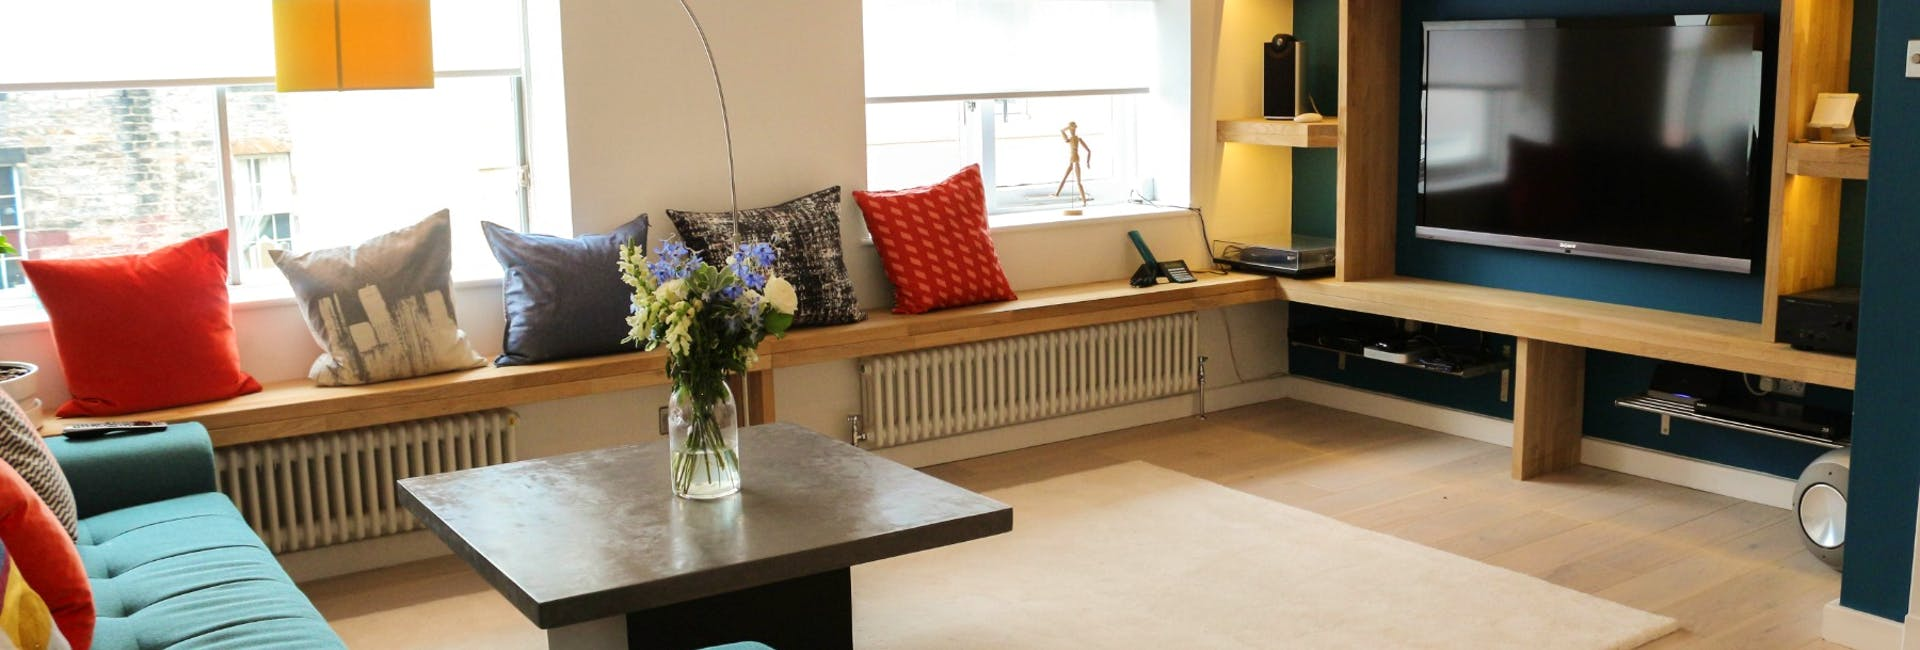 Featured Image for 24  Dublin Street Lane South East New Town and Hillside Edinburgh